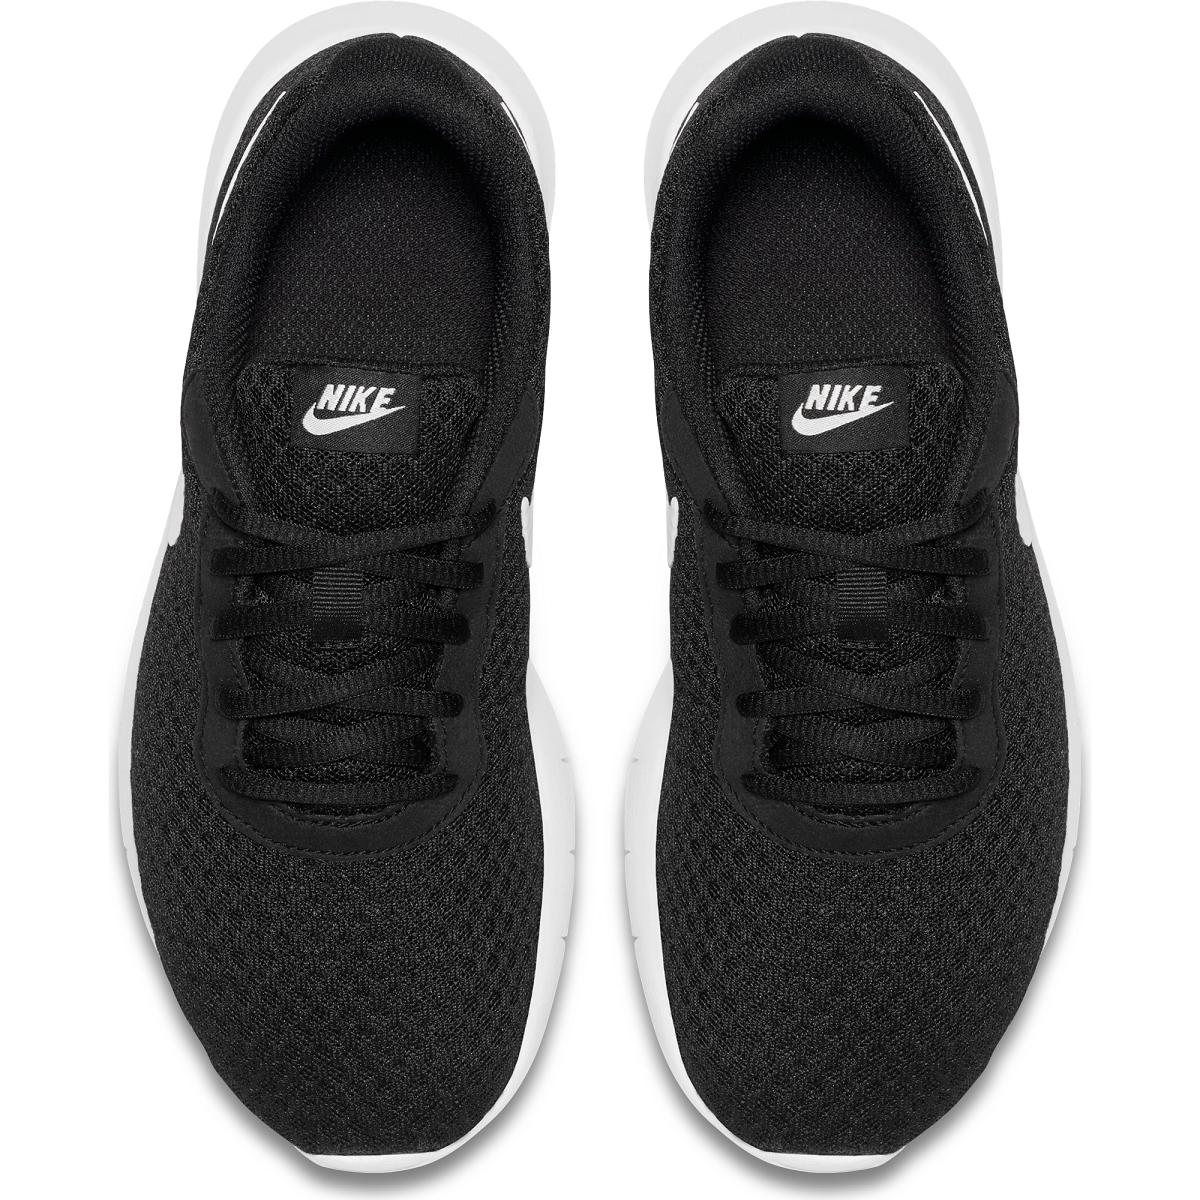 TanjunGSSchuhe Nike TanjunGSSchuhe TanjunGSSchuhe Nike Nike Nike TanjunGSSchuhe kOXTiuZP